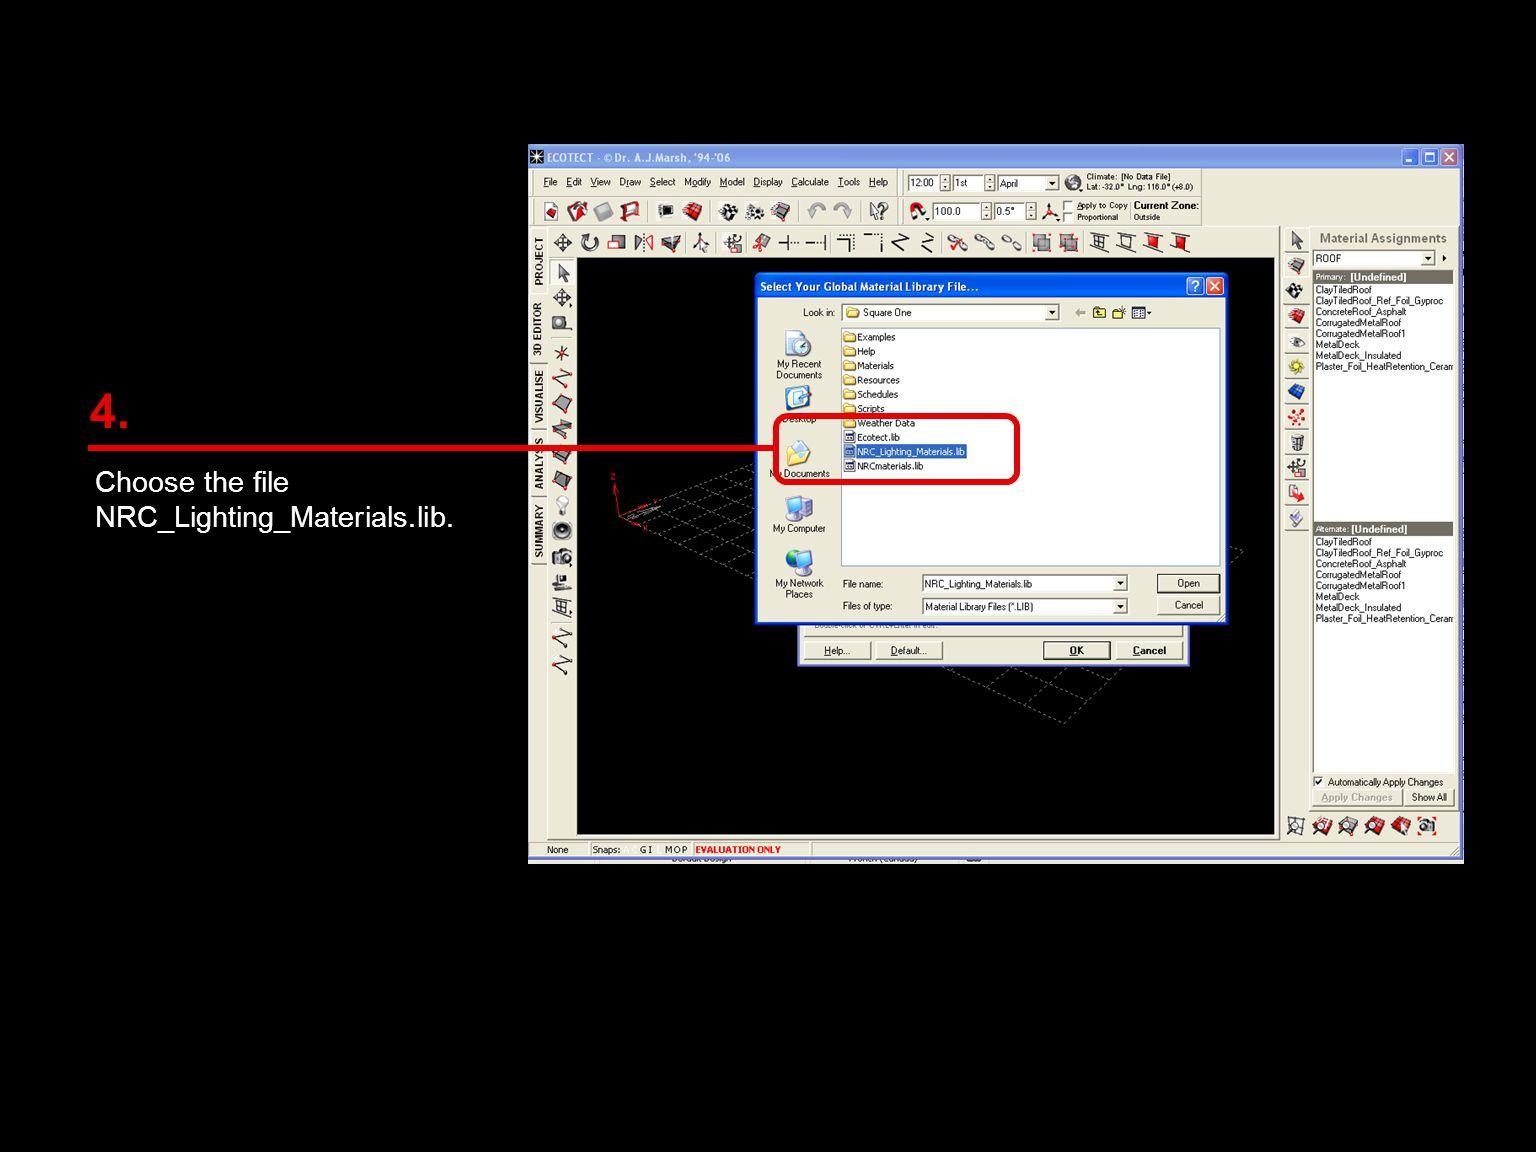 Choose the file NRC_Lighting_Materials.lib. 4.